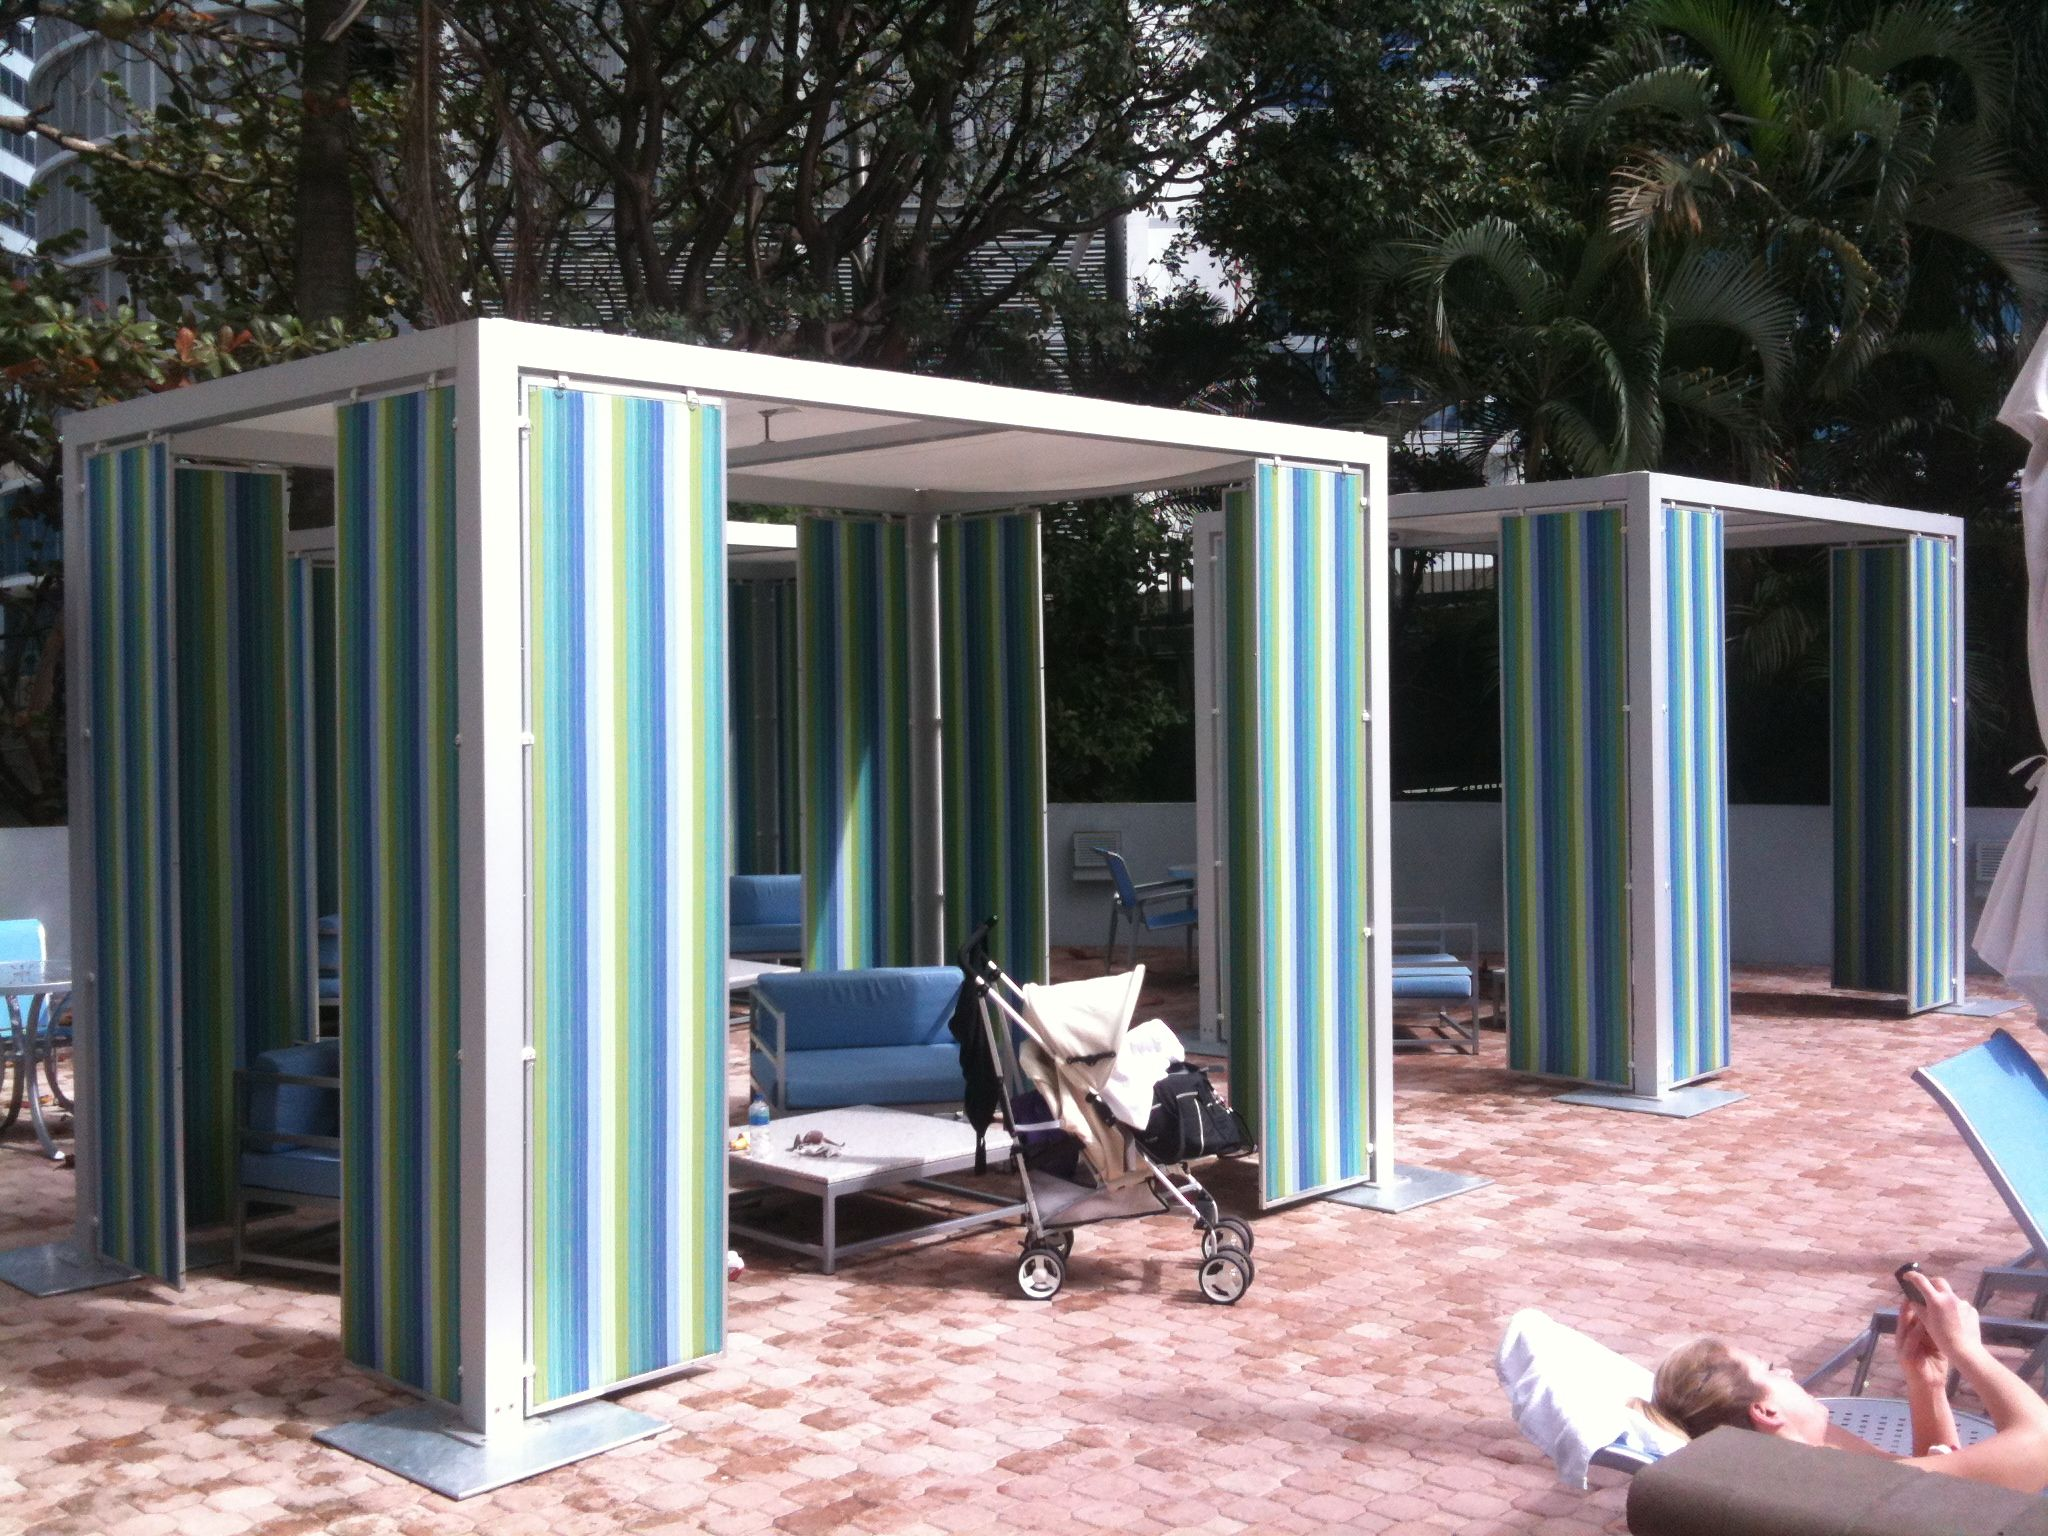 TUUCI Custom Modern Cabanas Hyatt Regency Downtown Miami